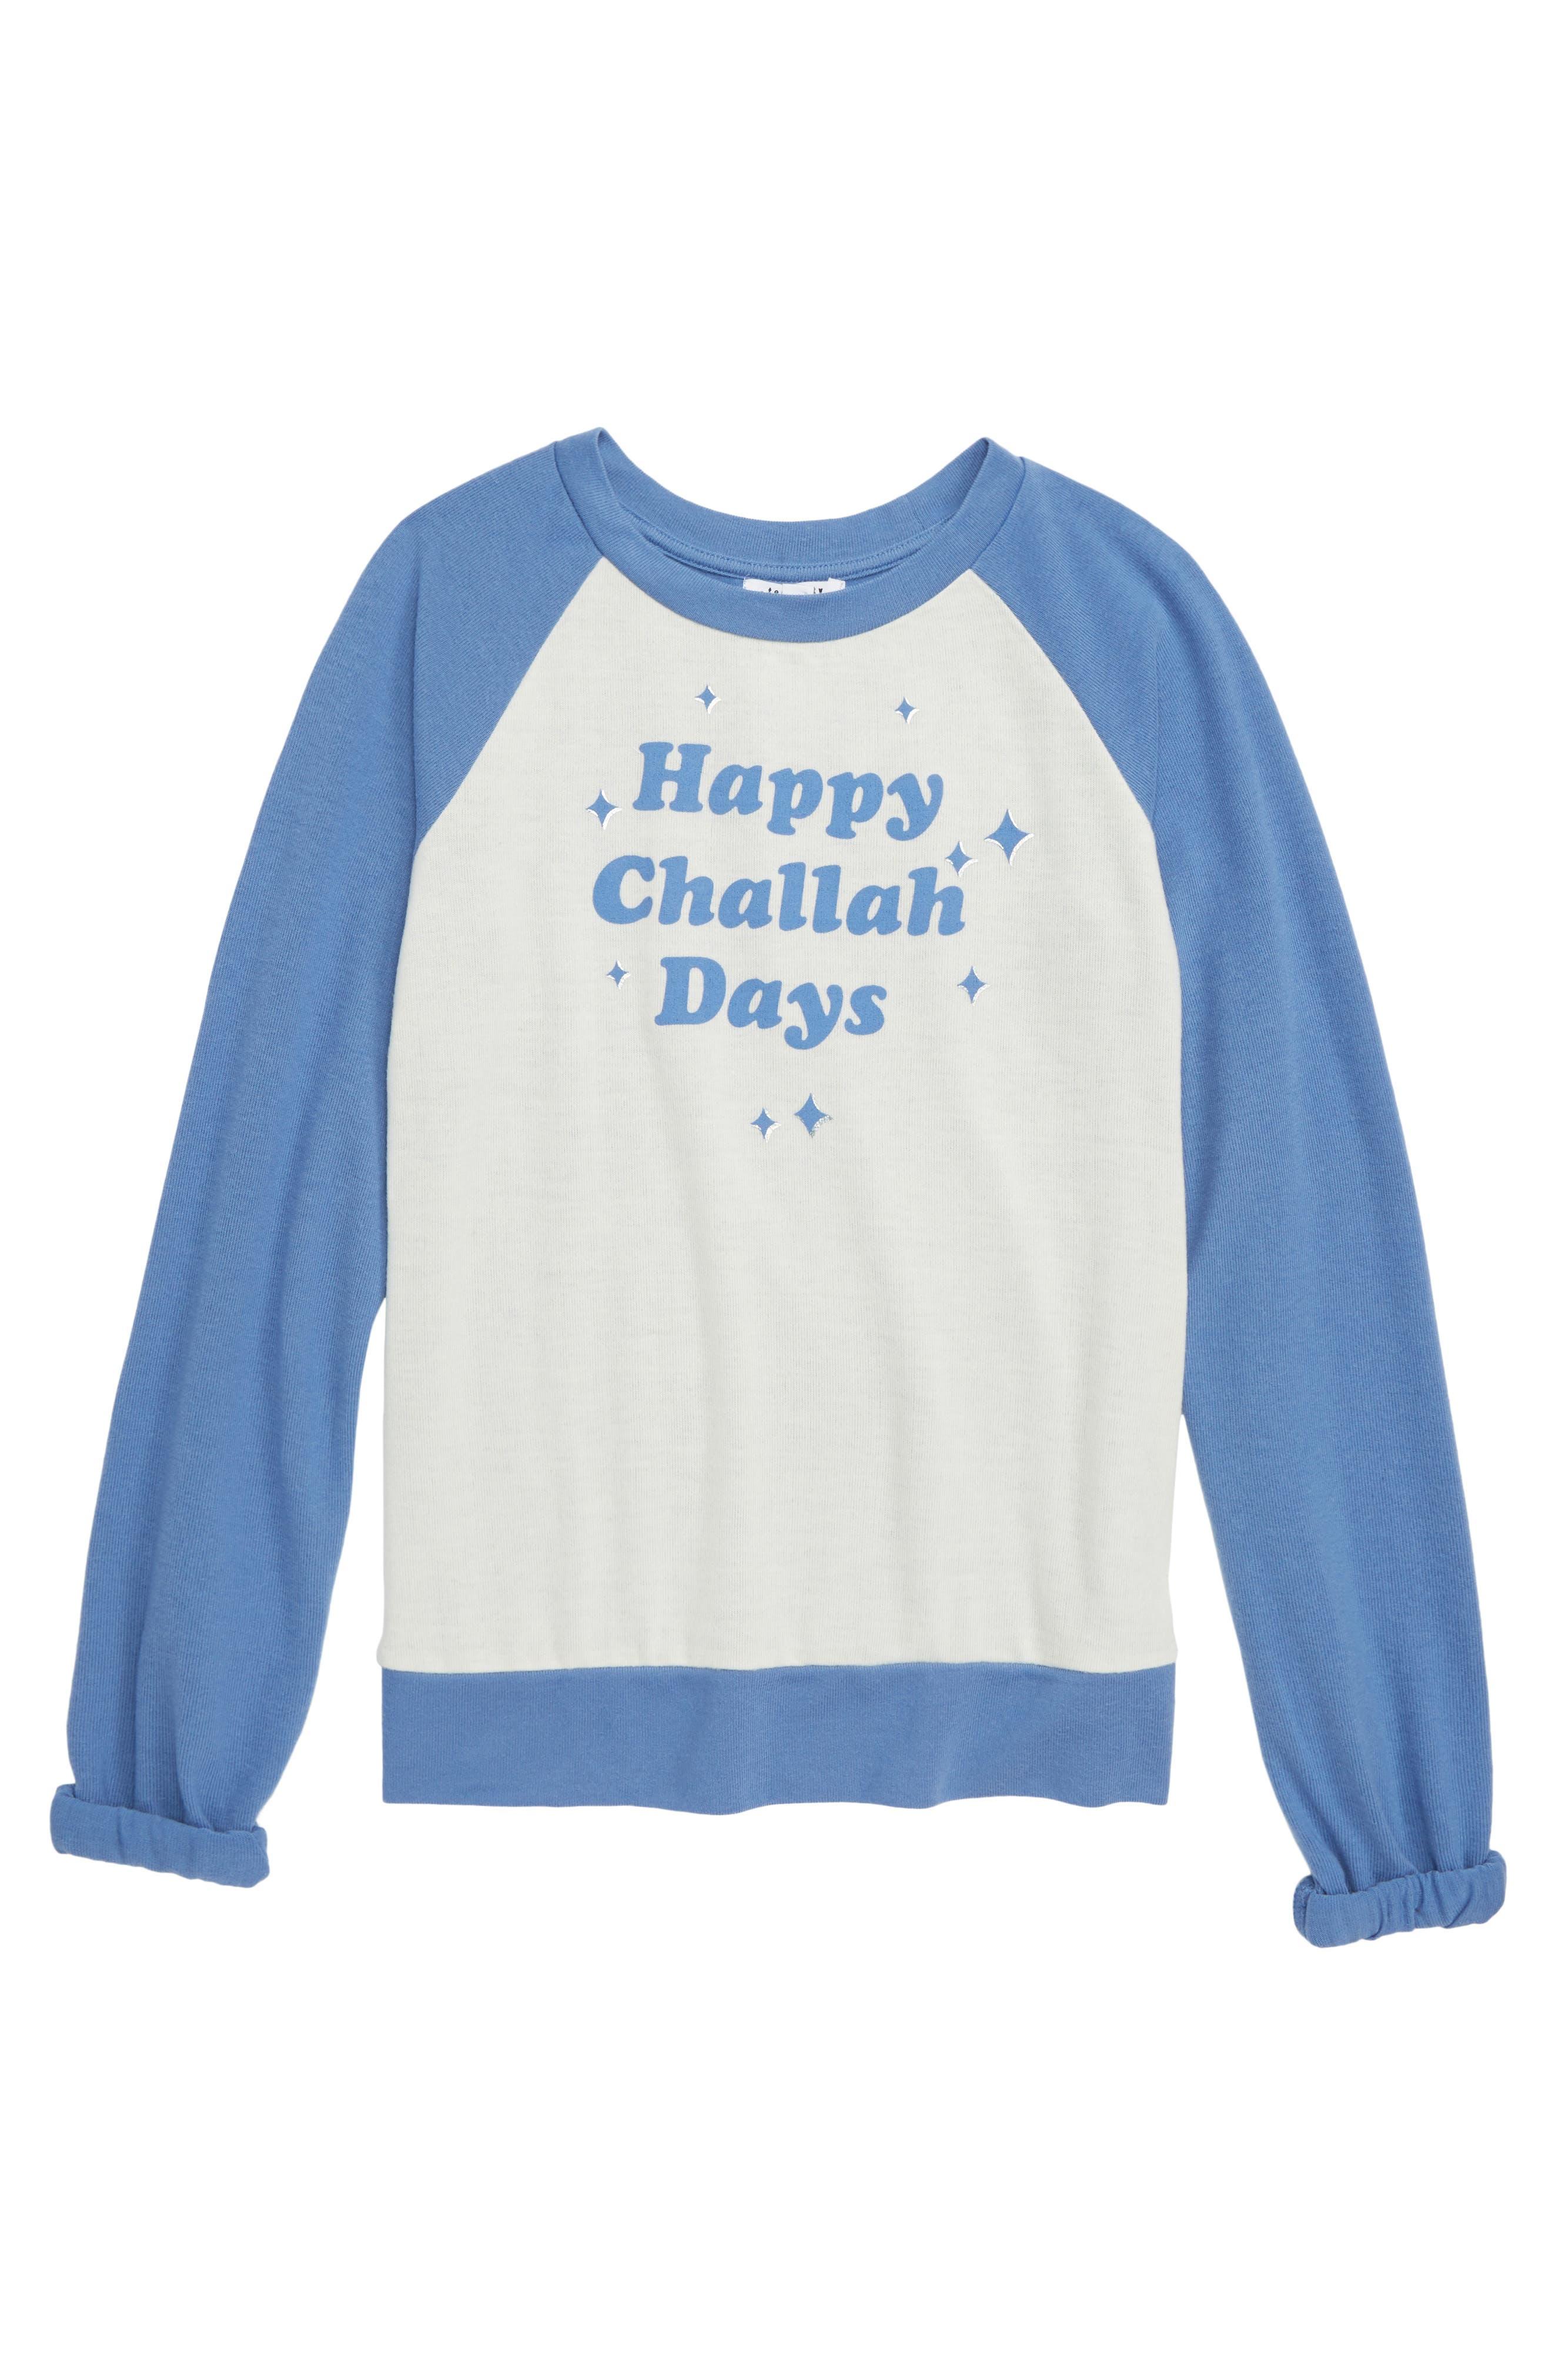 Happy Challah Days Baseball Tee,                             Main thumbnail 1, color,                             BLUE/ IVORY